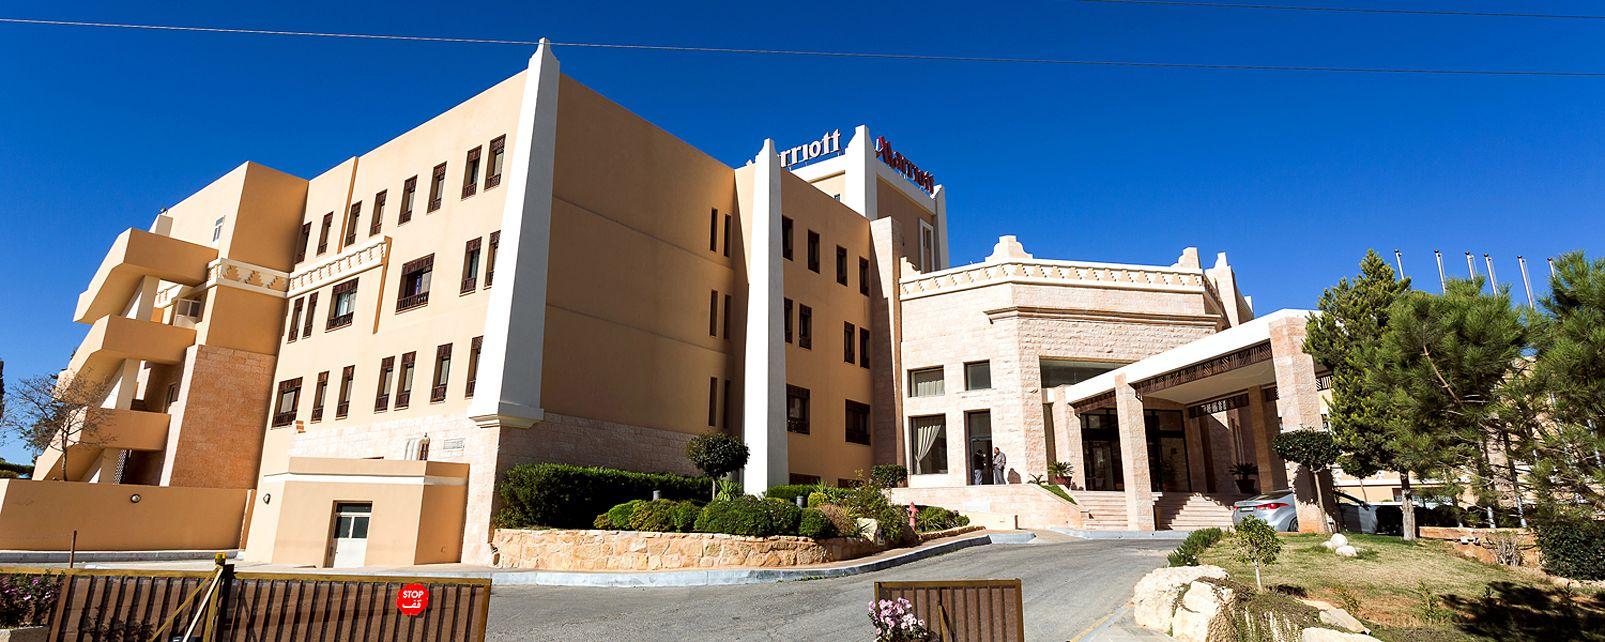 H tel marriott petra petra jordanie for Hotels jordanie